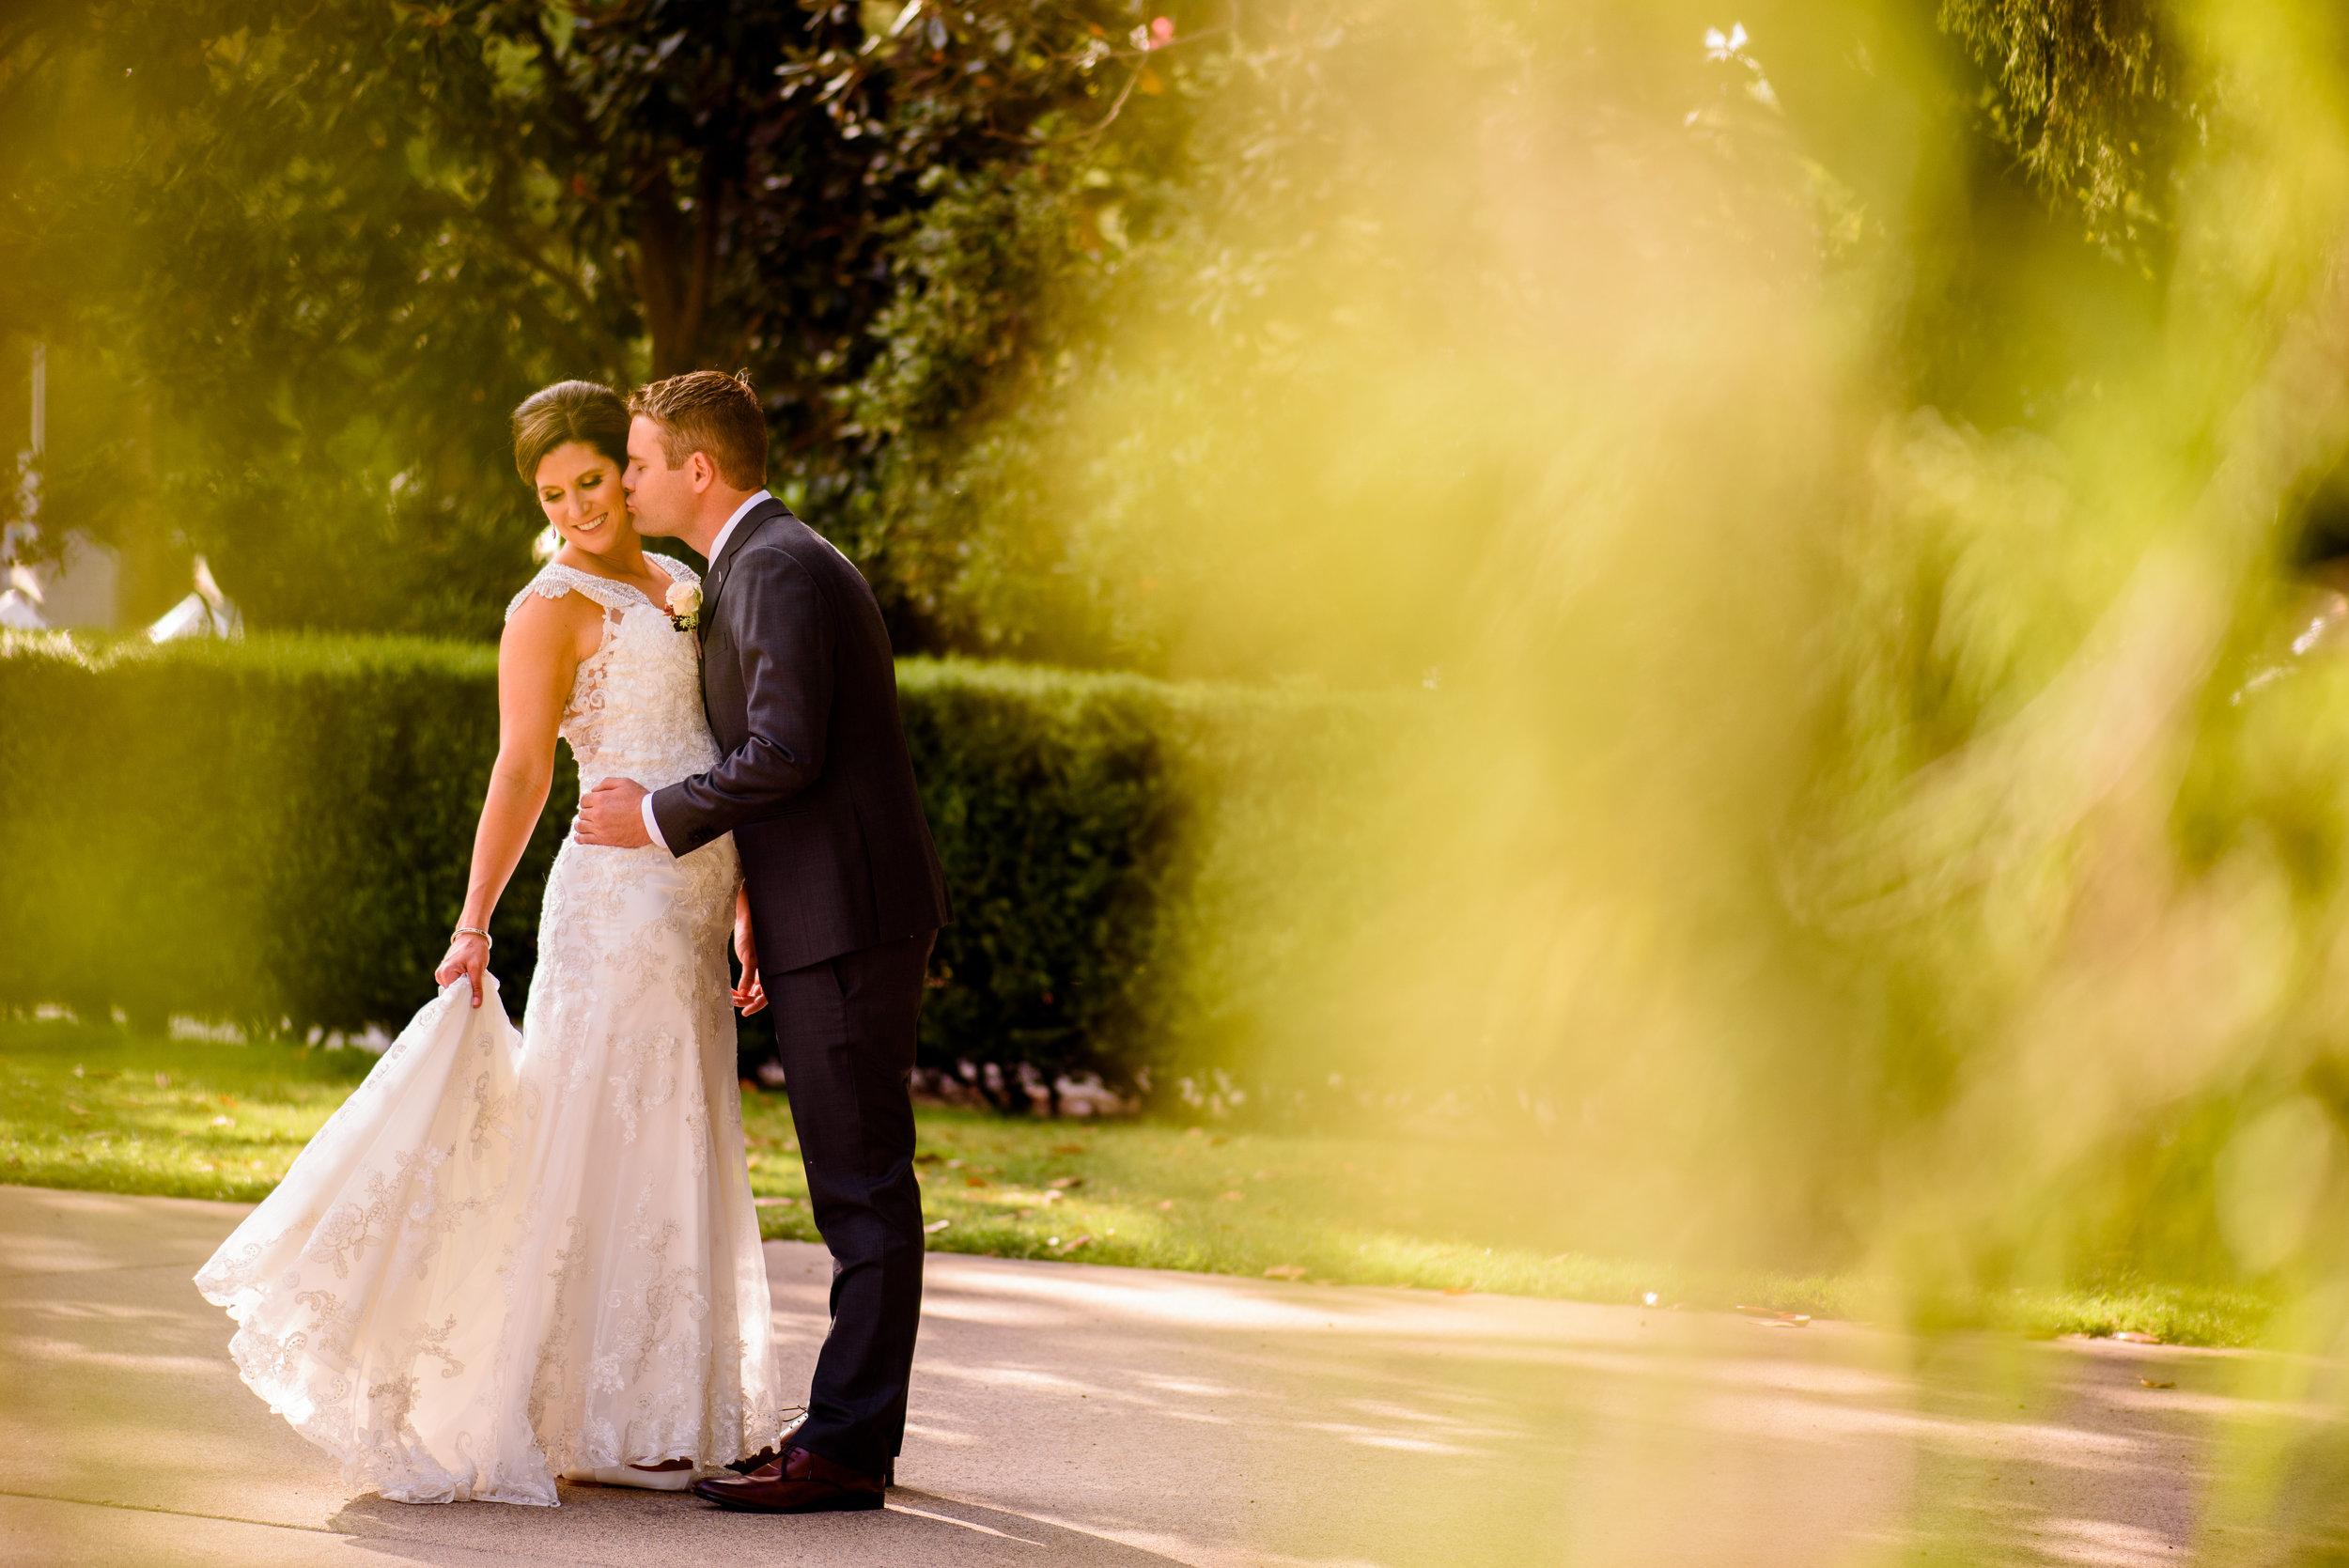 annie-brian-001-antiquite-midtown-sacramento-wedding-photographer-katherine-nicole-photography.JPG